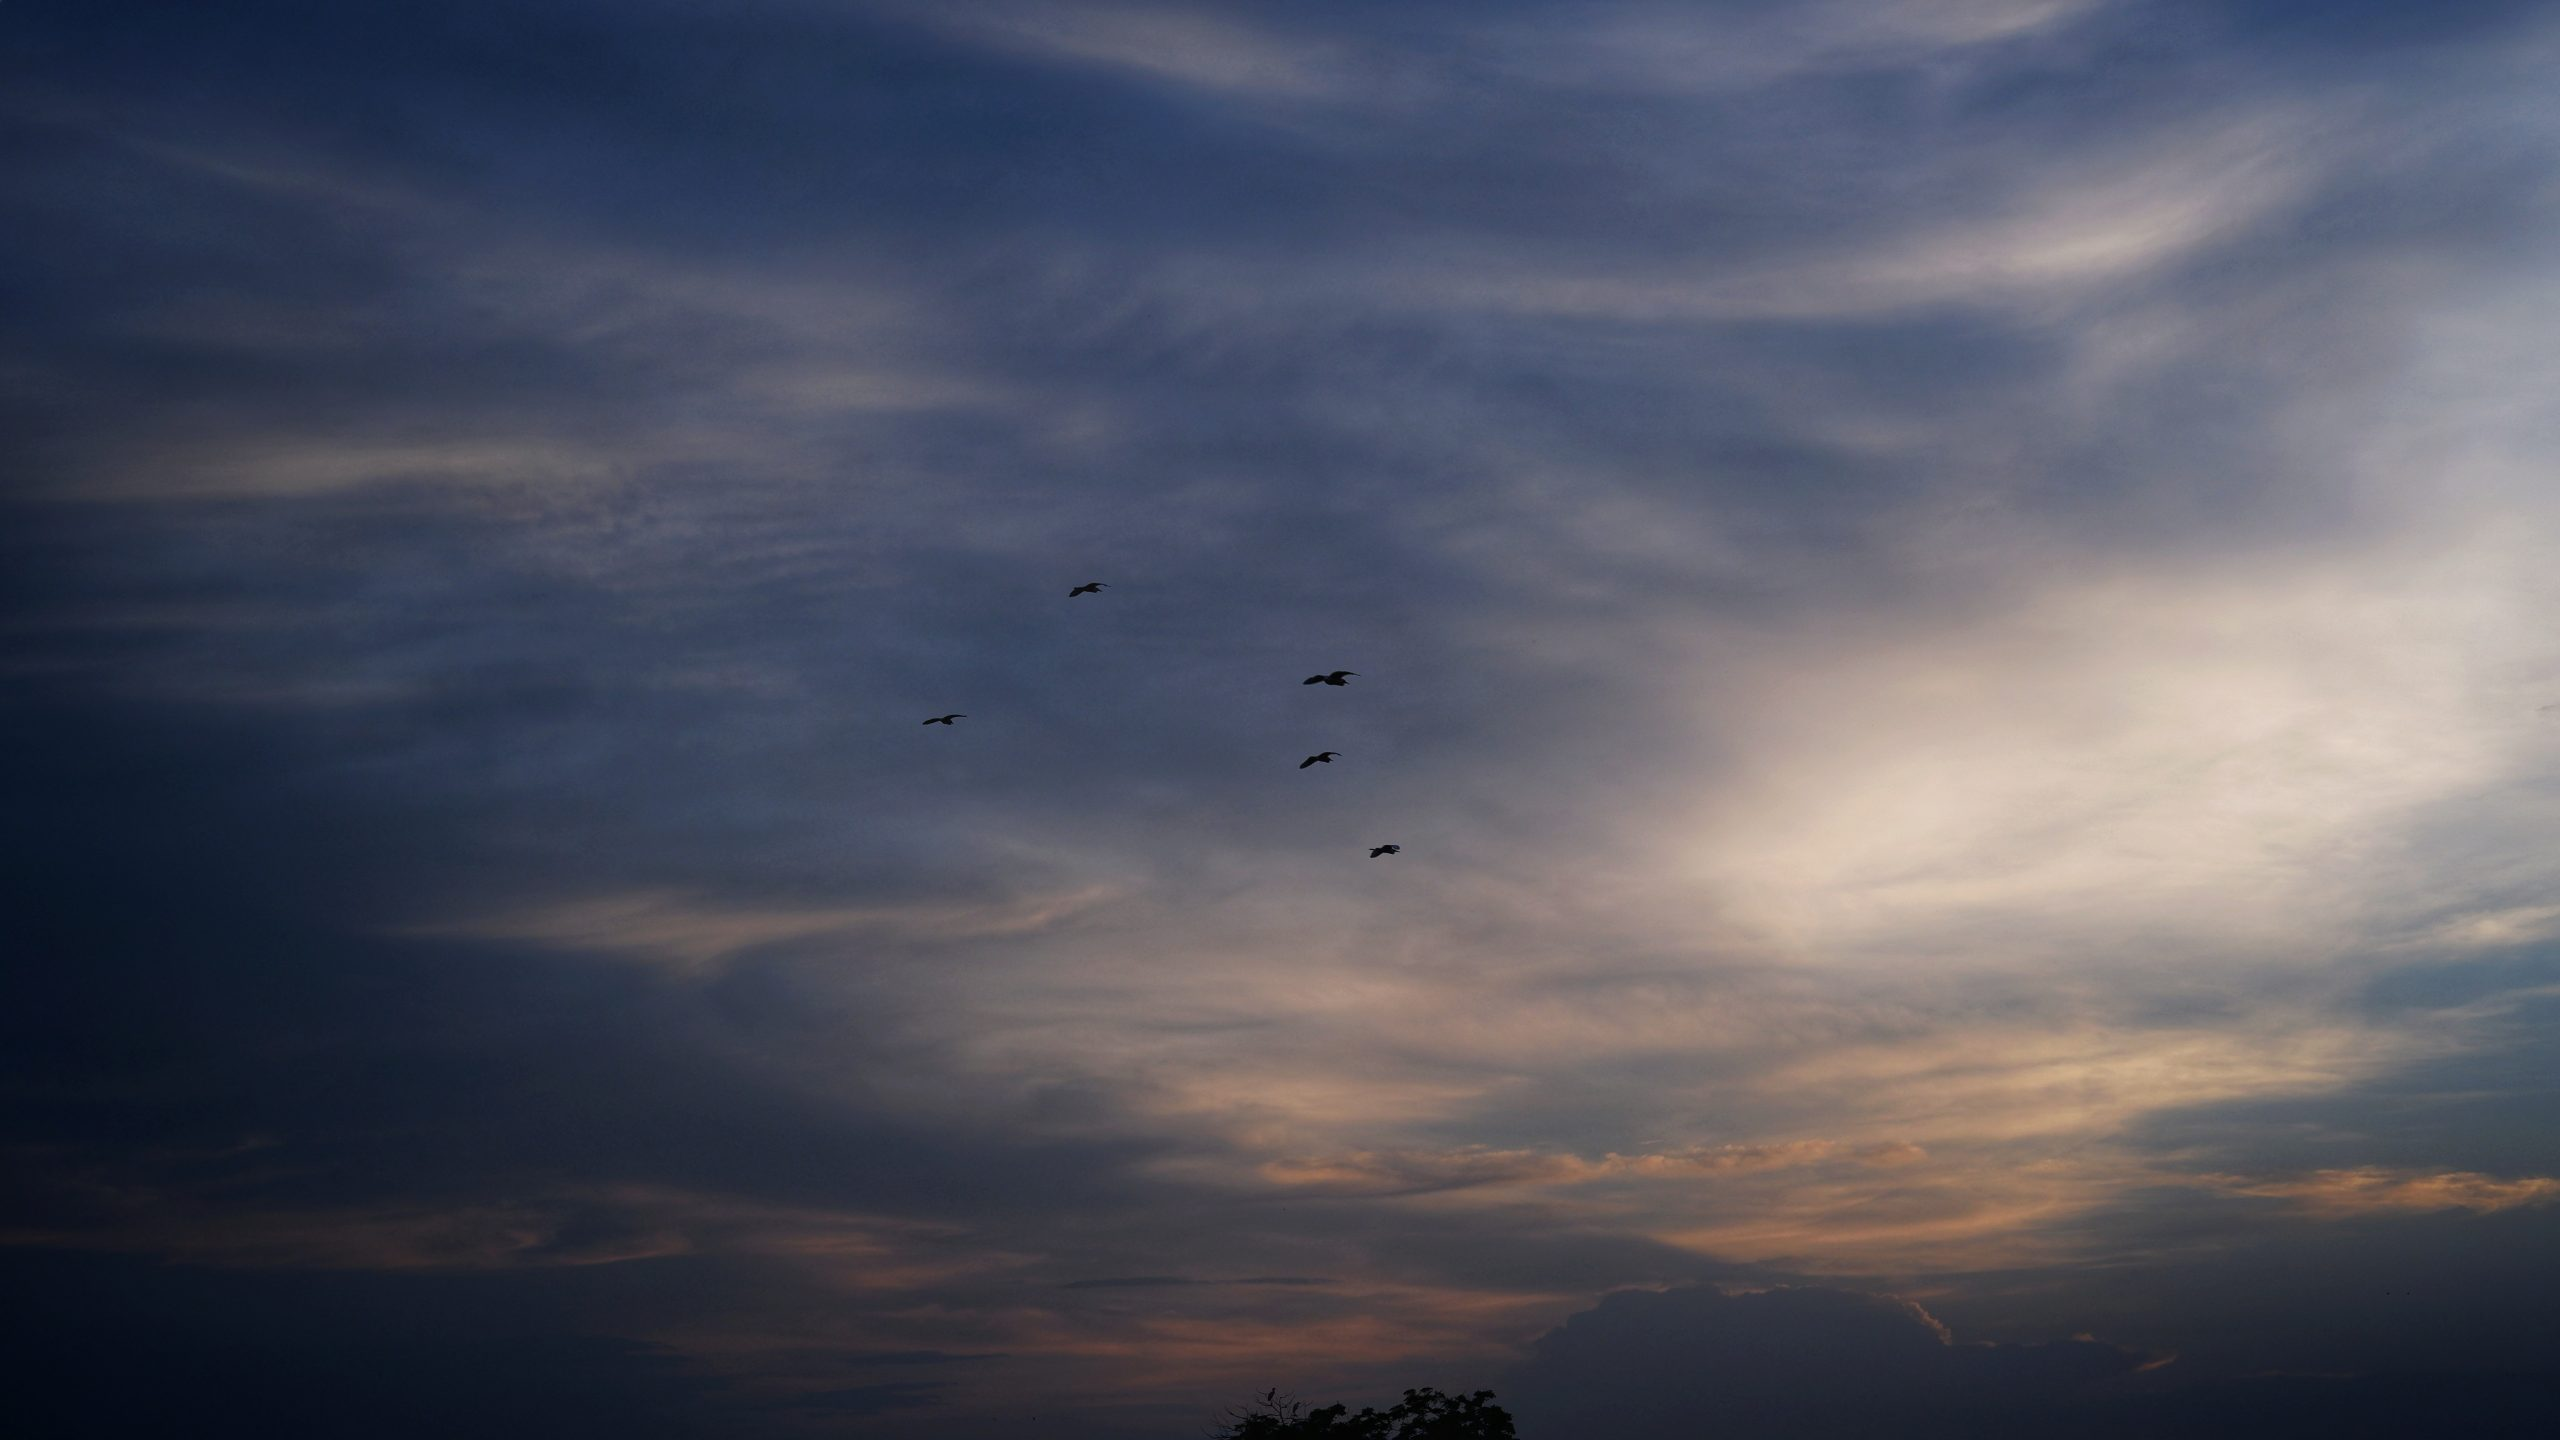 birds flying high in the sky